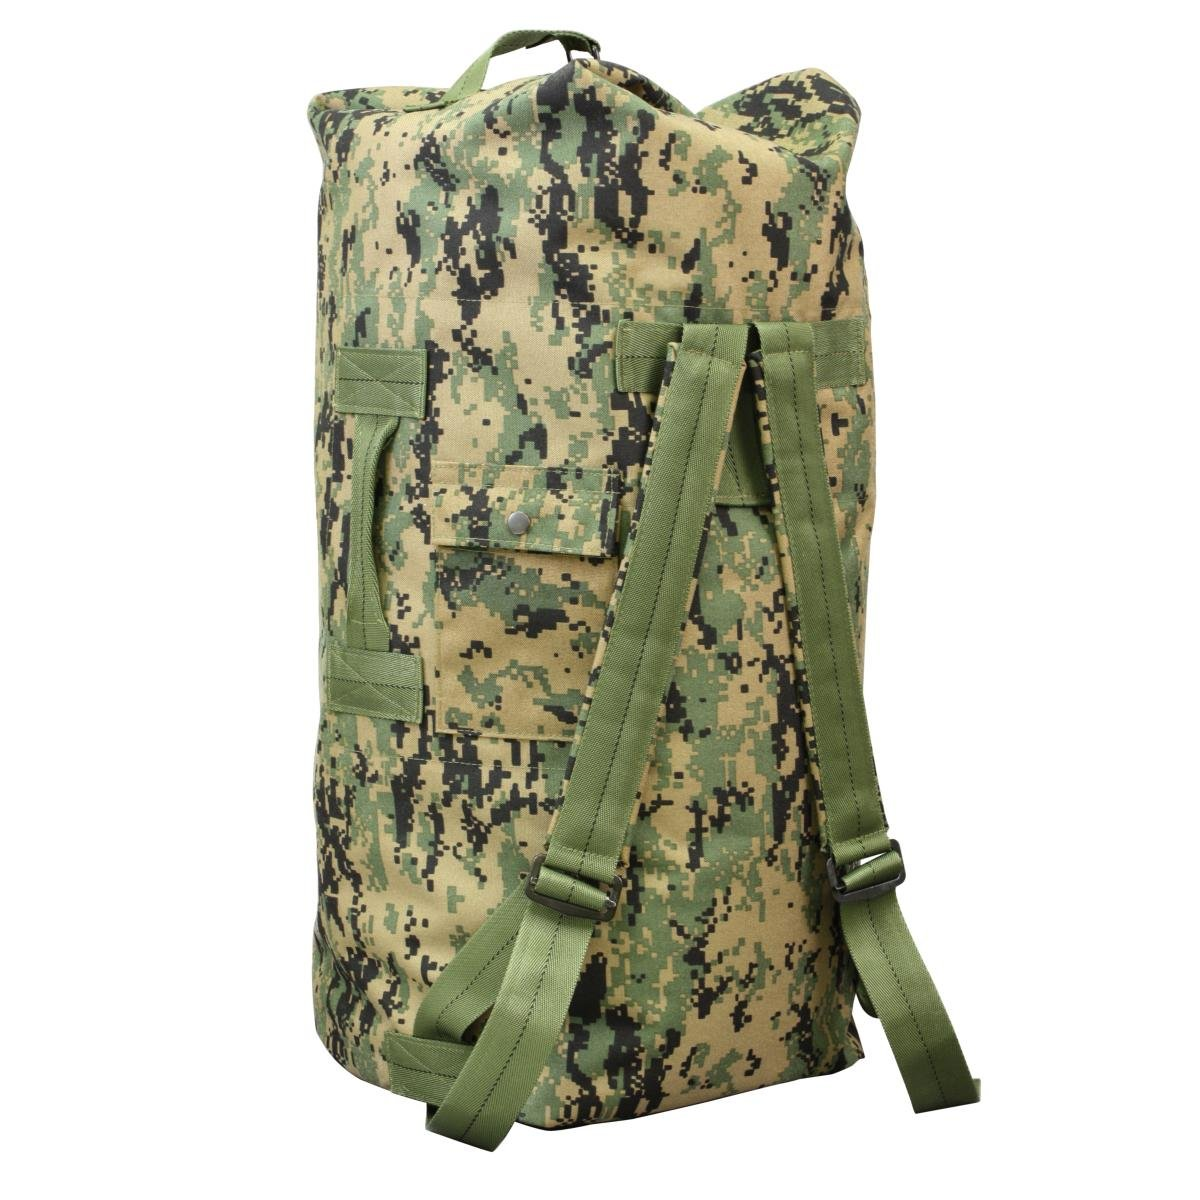 Rothco Gi Type Double Strap Duffle Bag B0025M3O54  WOODLAND DIGI